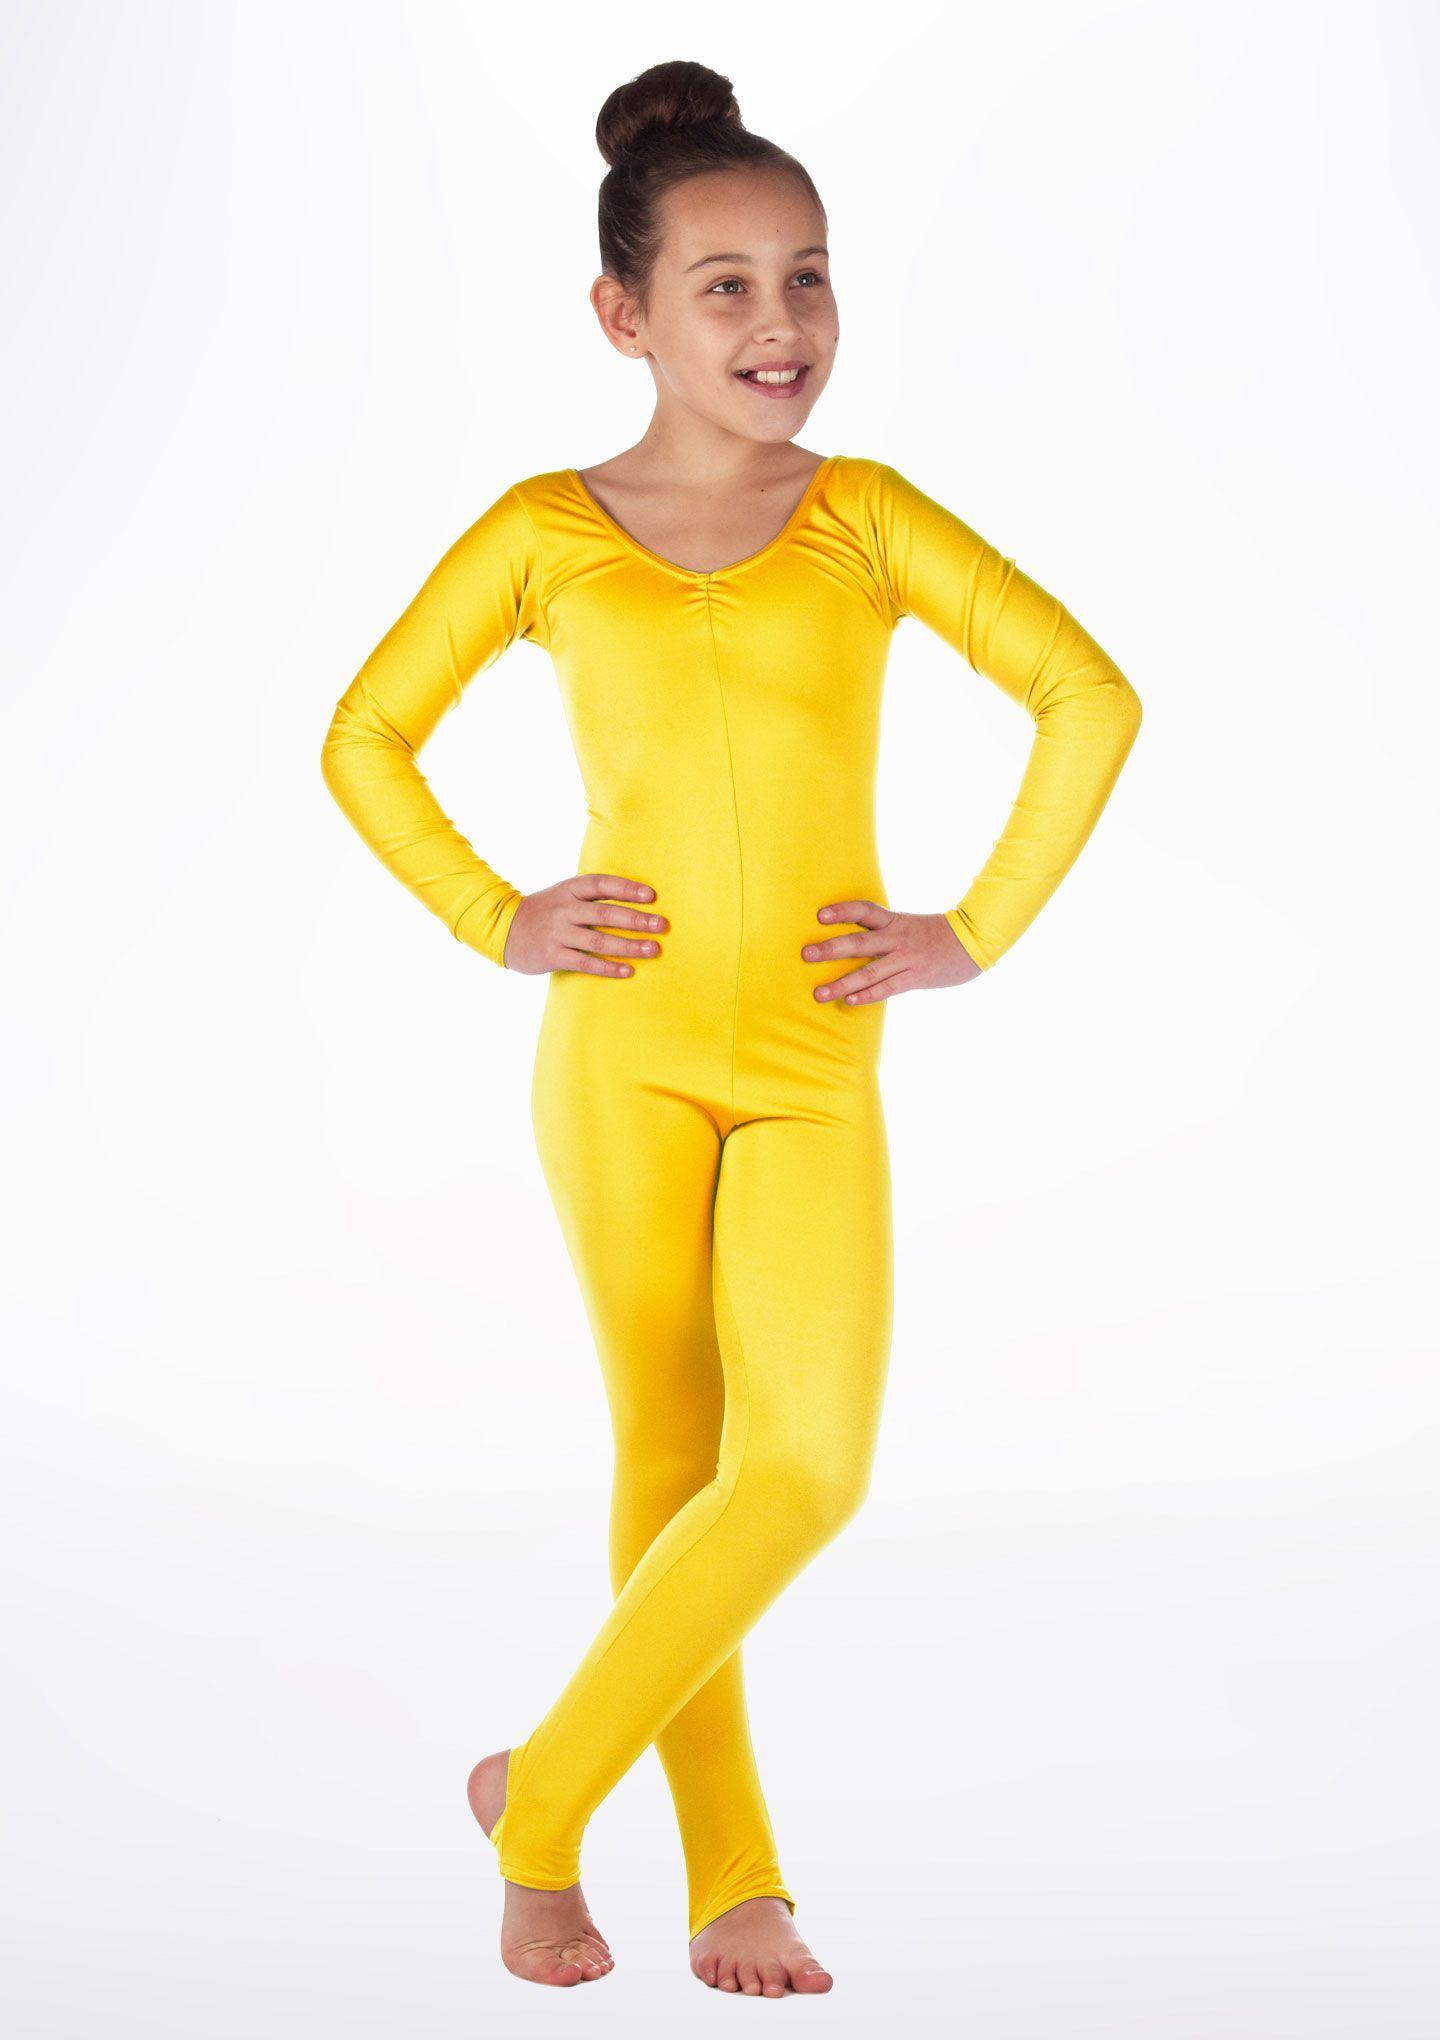 de71600103316d Alegra Girls Shiny Blaine Catsuit   Holidays - Halloween   Catsuit ...